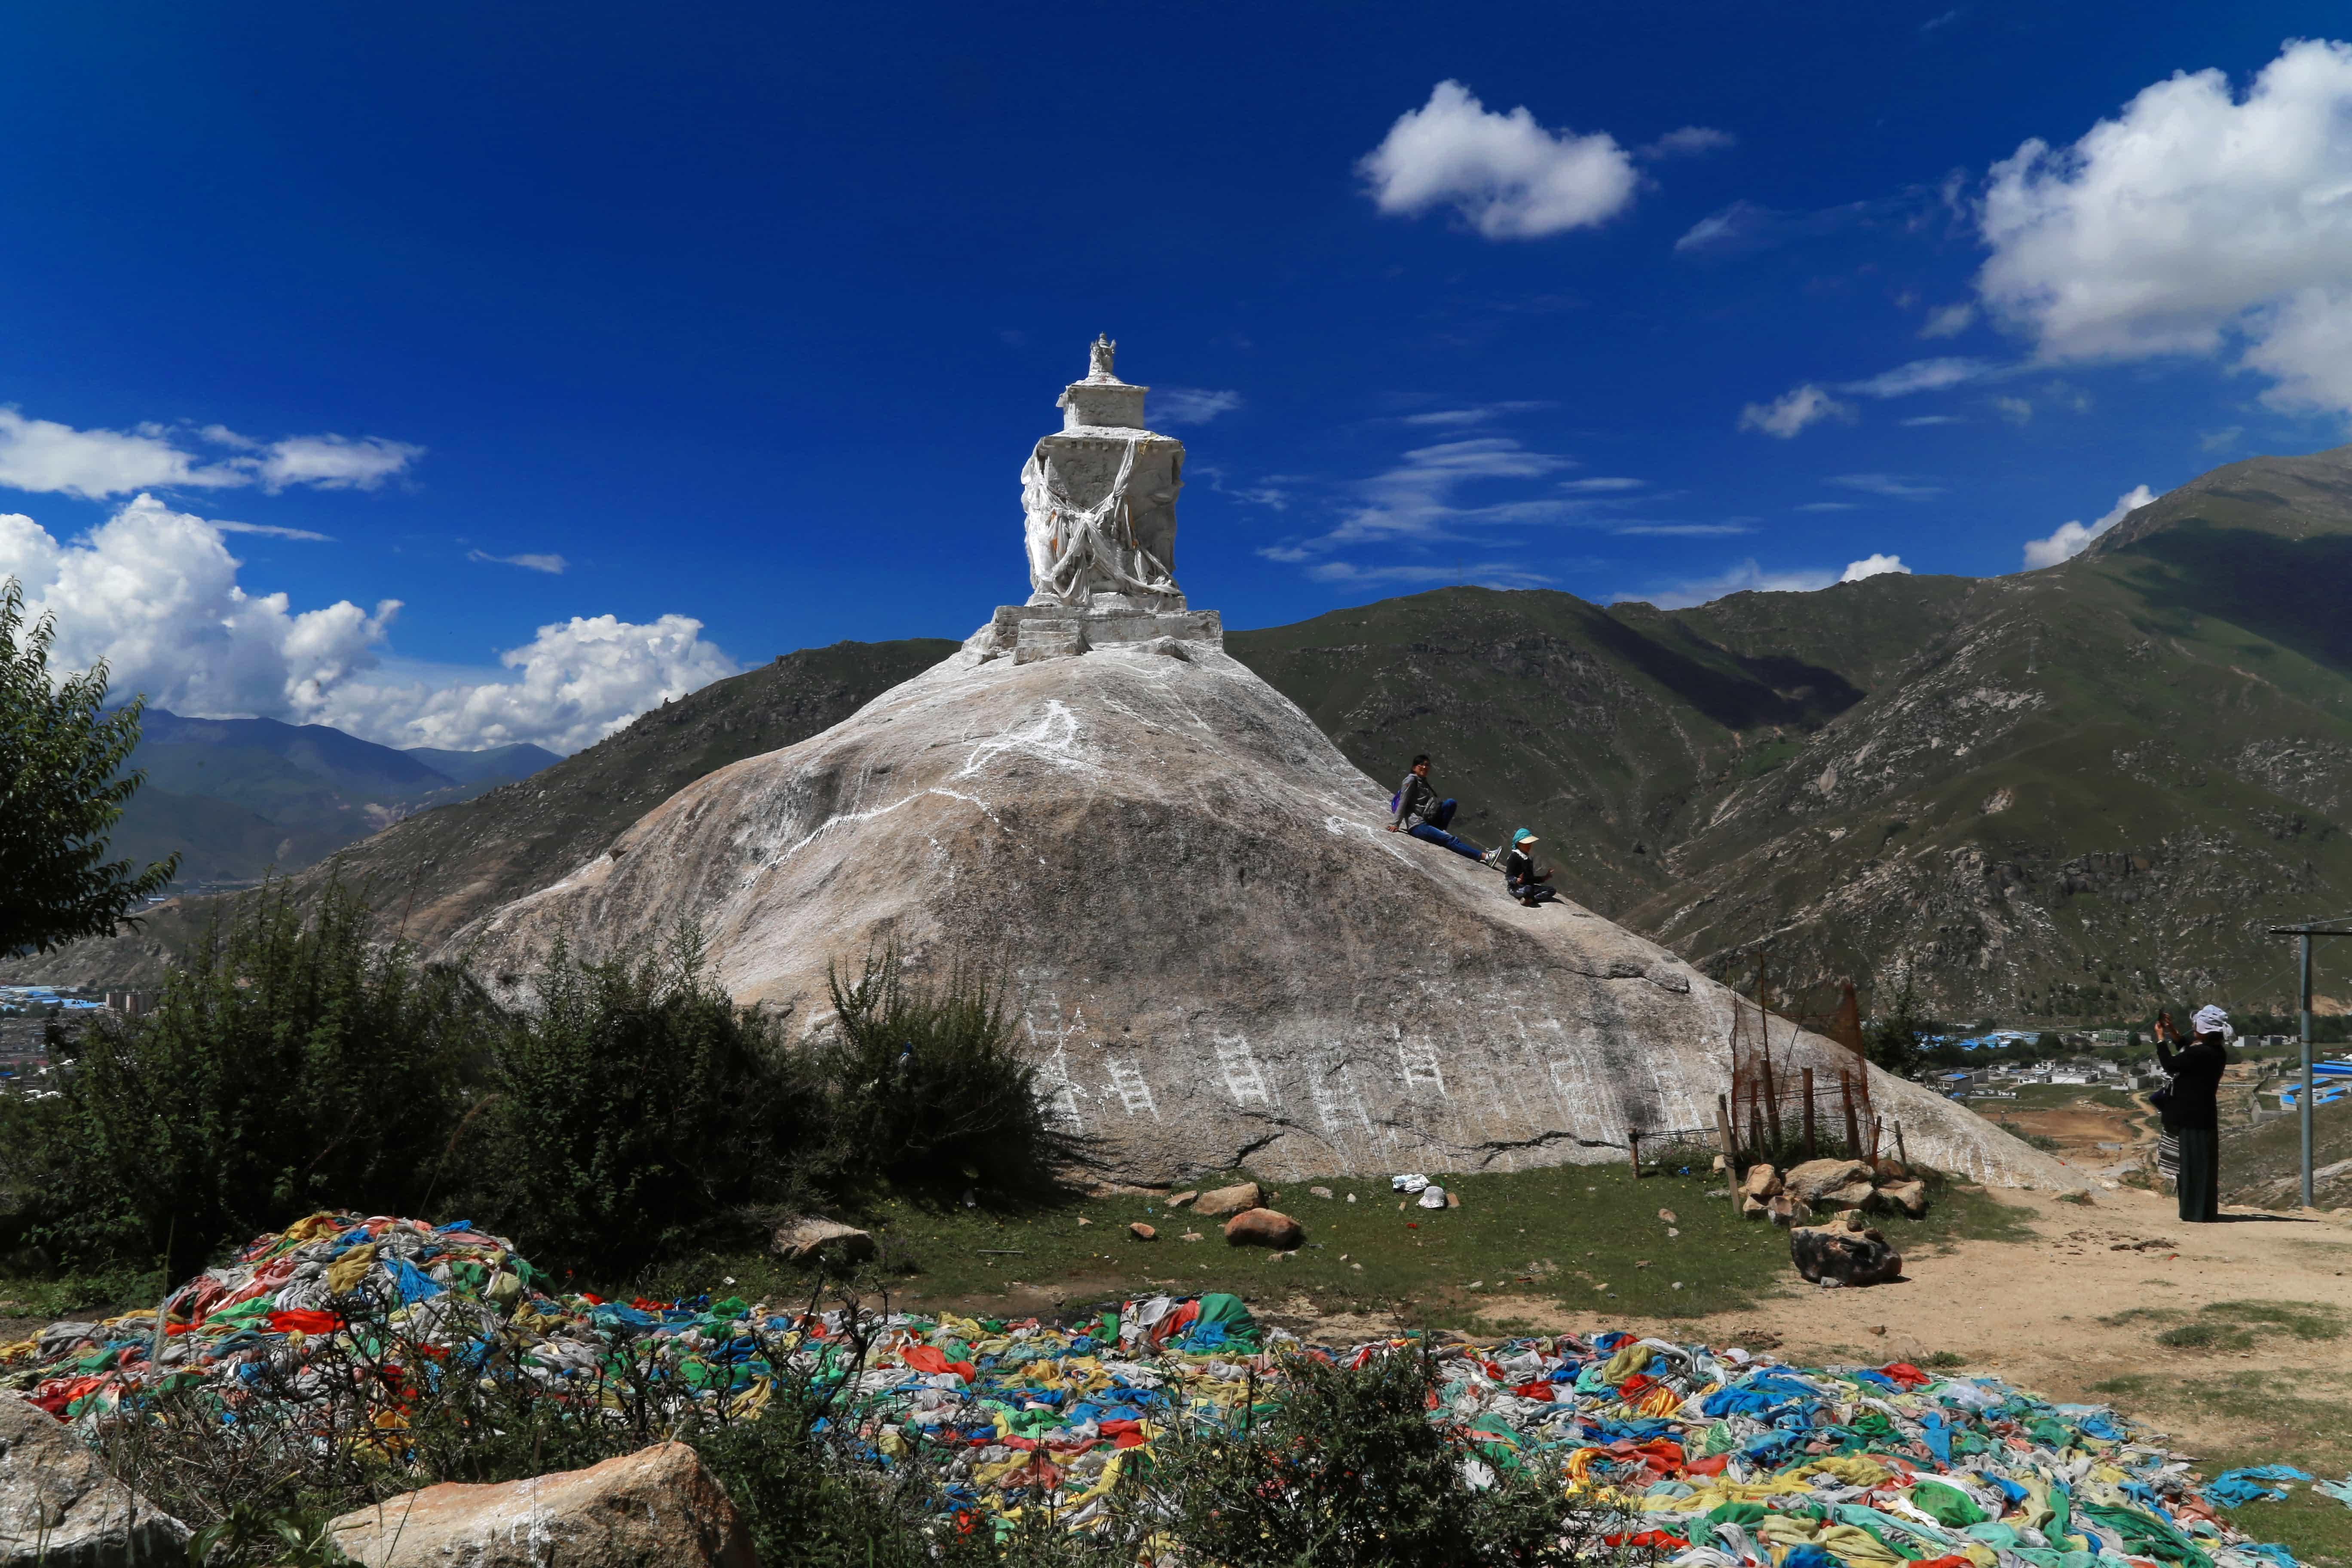 Stupa by Pabongka monastery in Lhasa